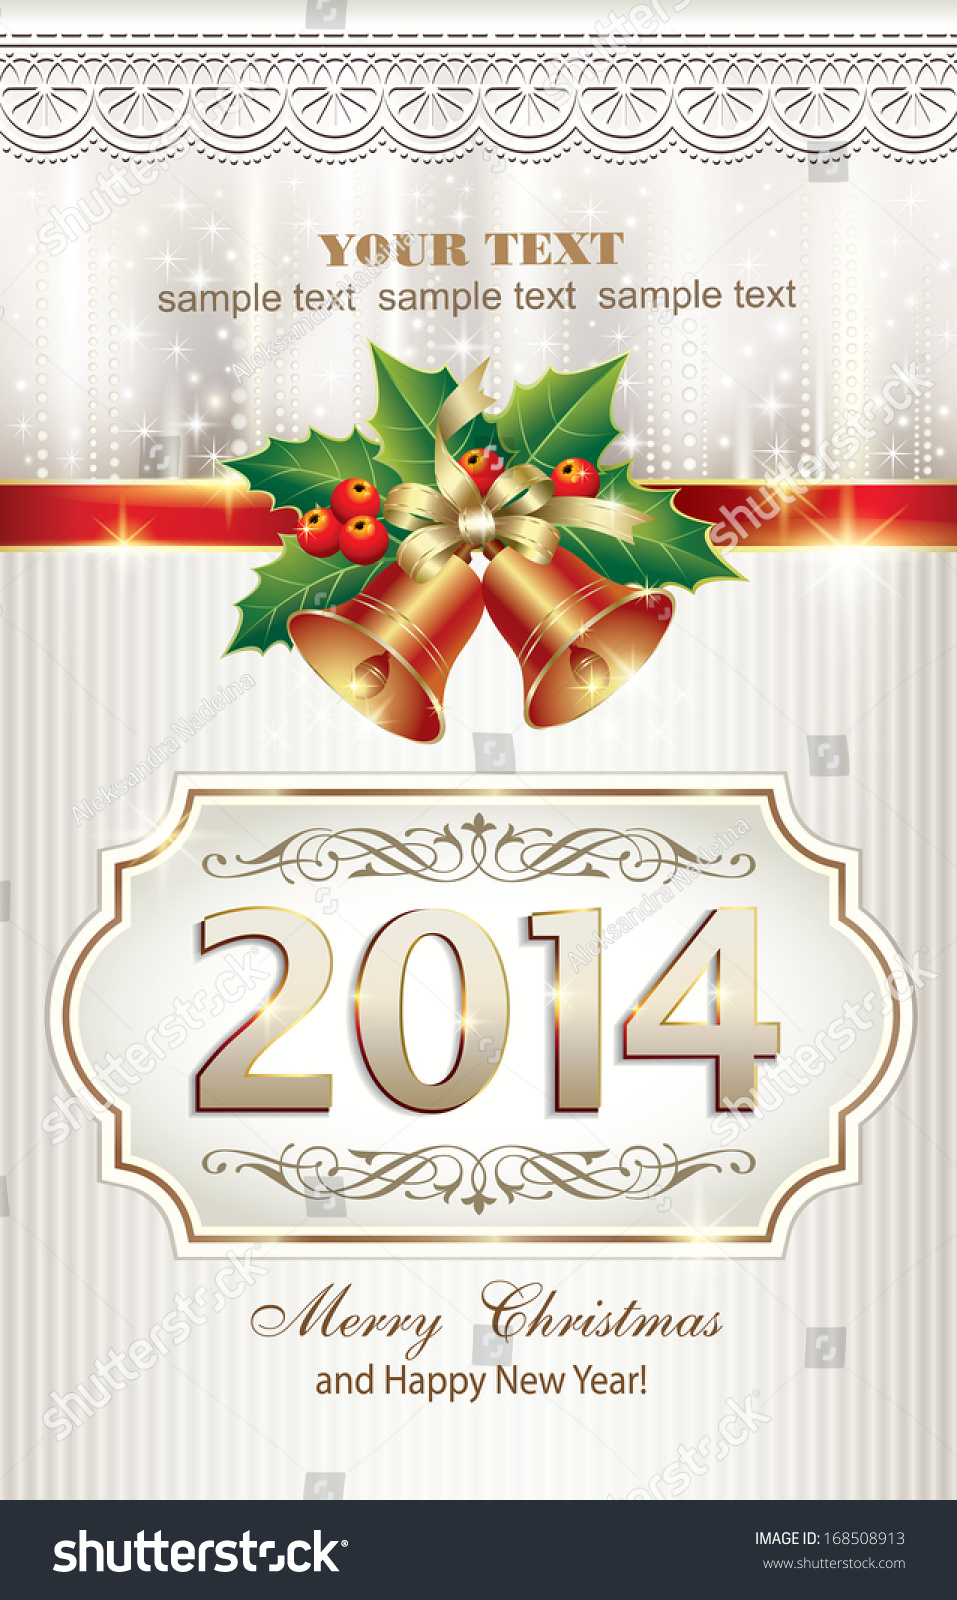 Christmas greeting card 2014 stock vector royalty free 168508913 christmas greeting card 2014 m4hsunfo